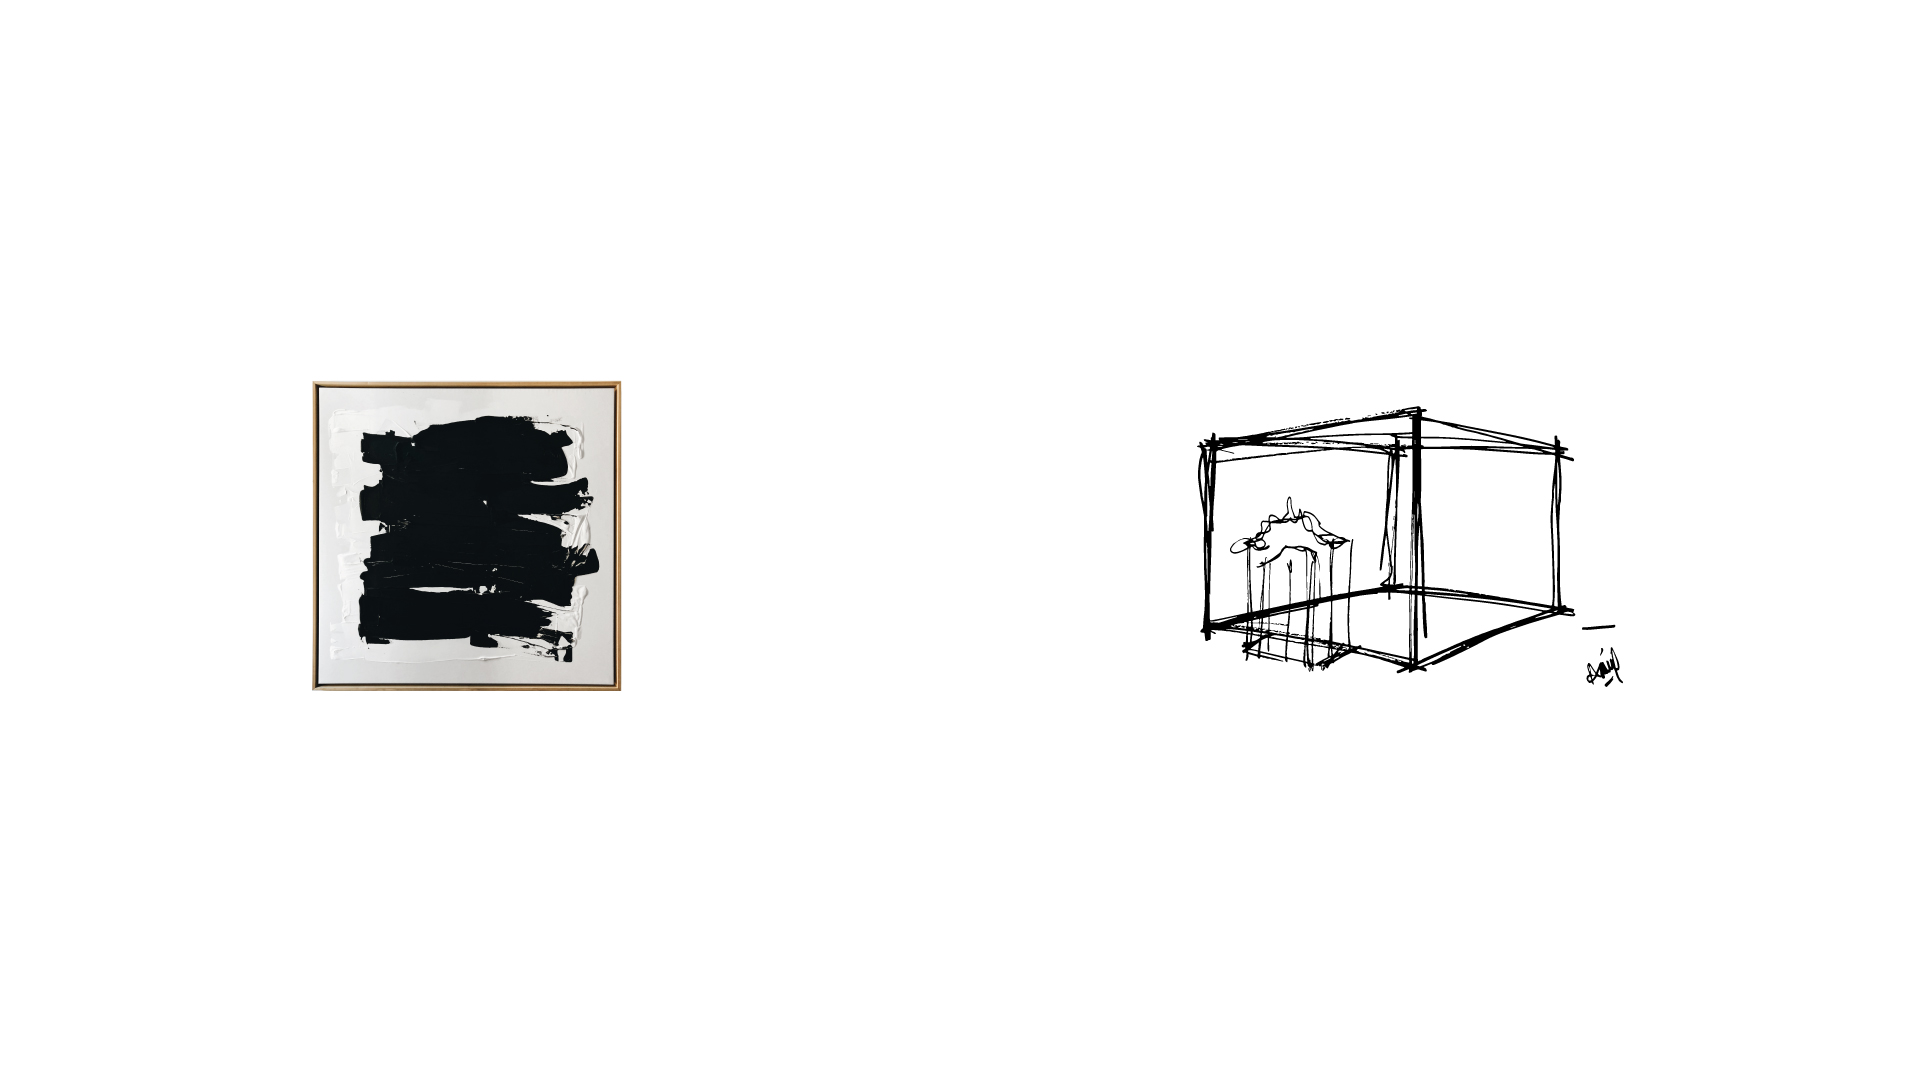 09-ENCONTREMONOS-AARON-NACHTAILER-ART-ARTIST